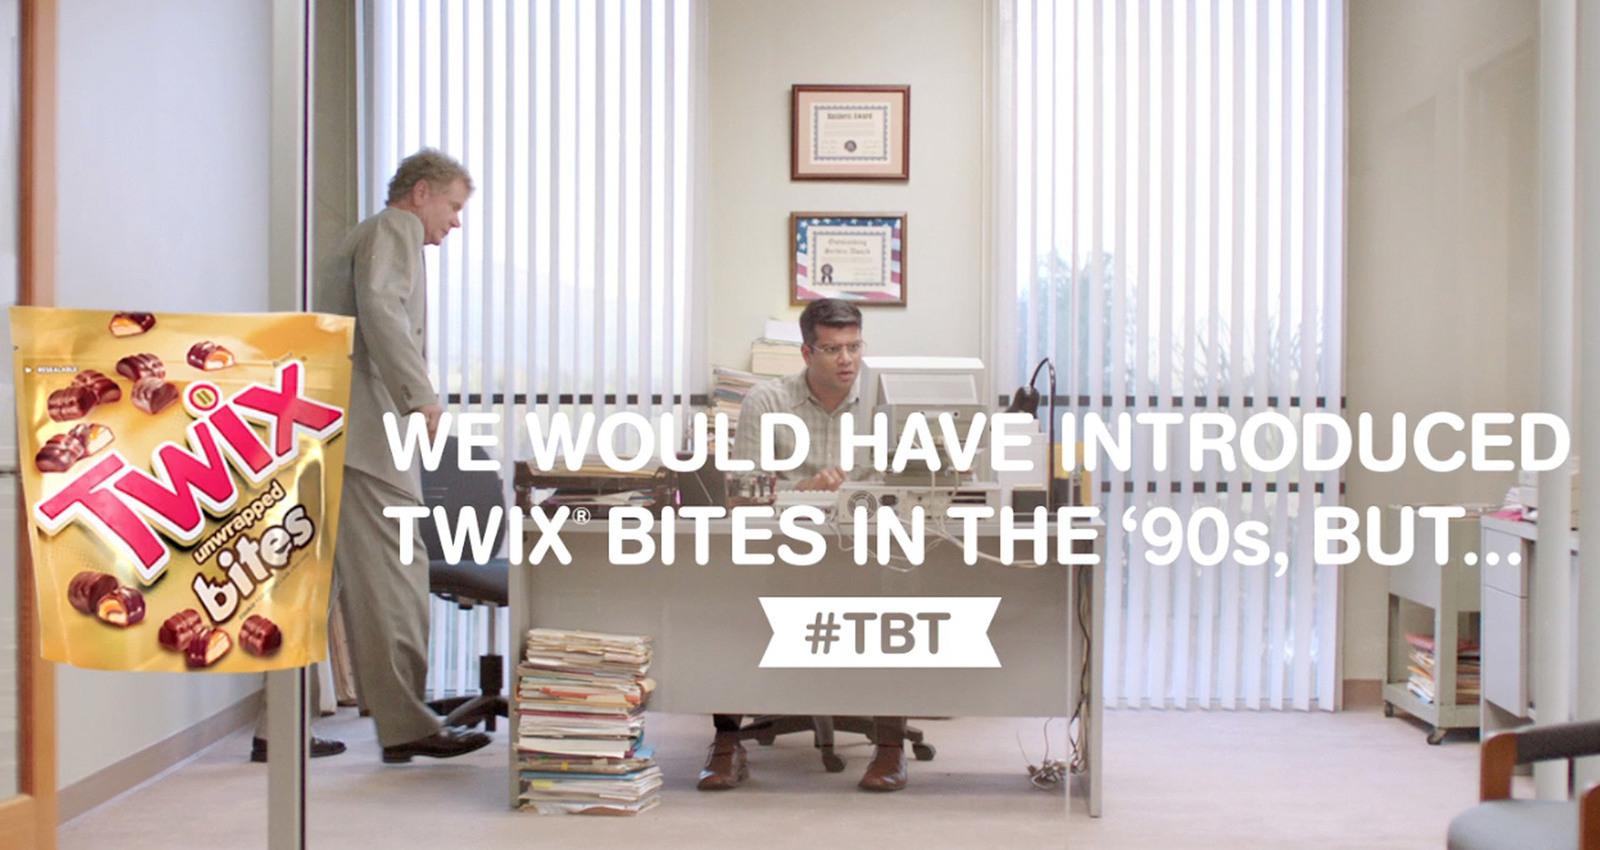 #TBT TV Campaign